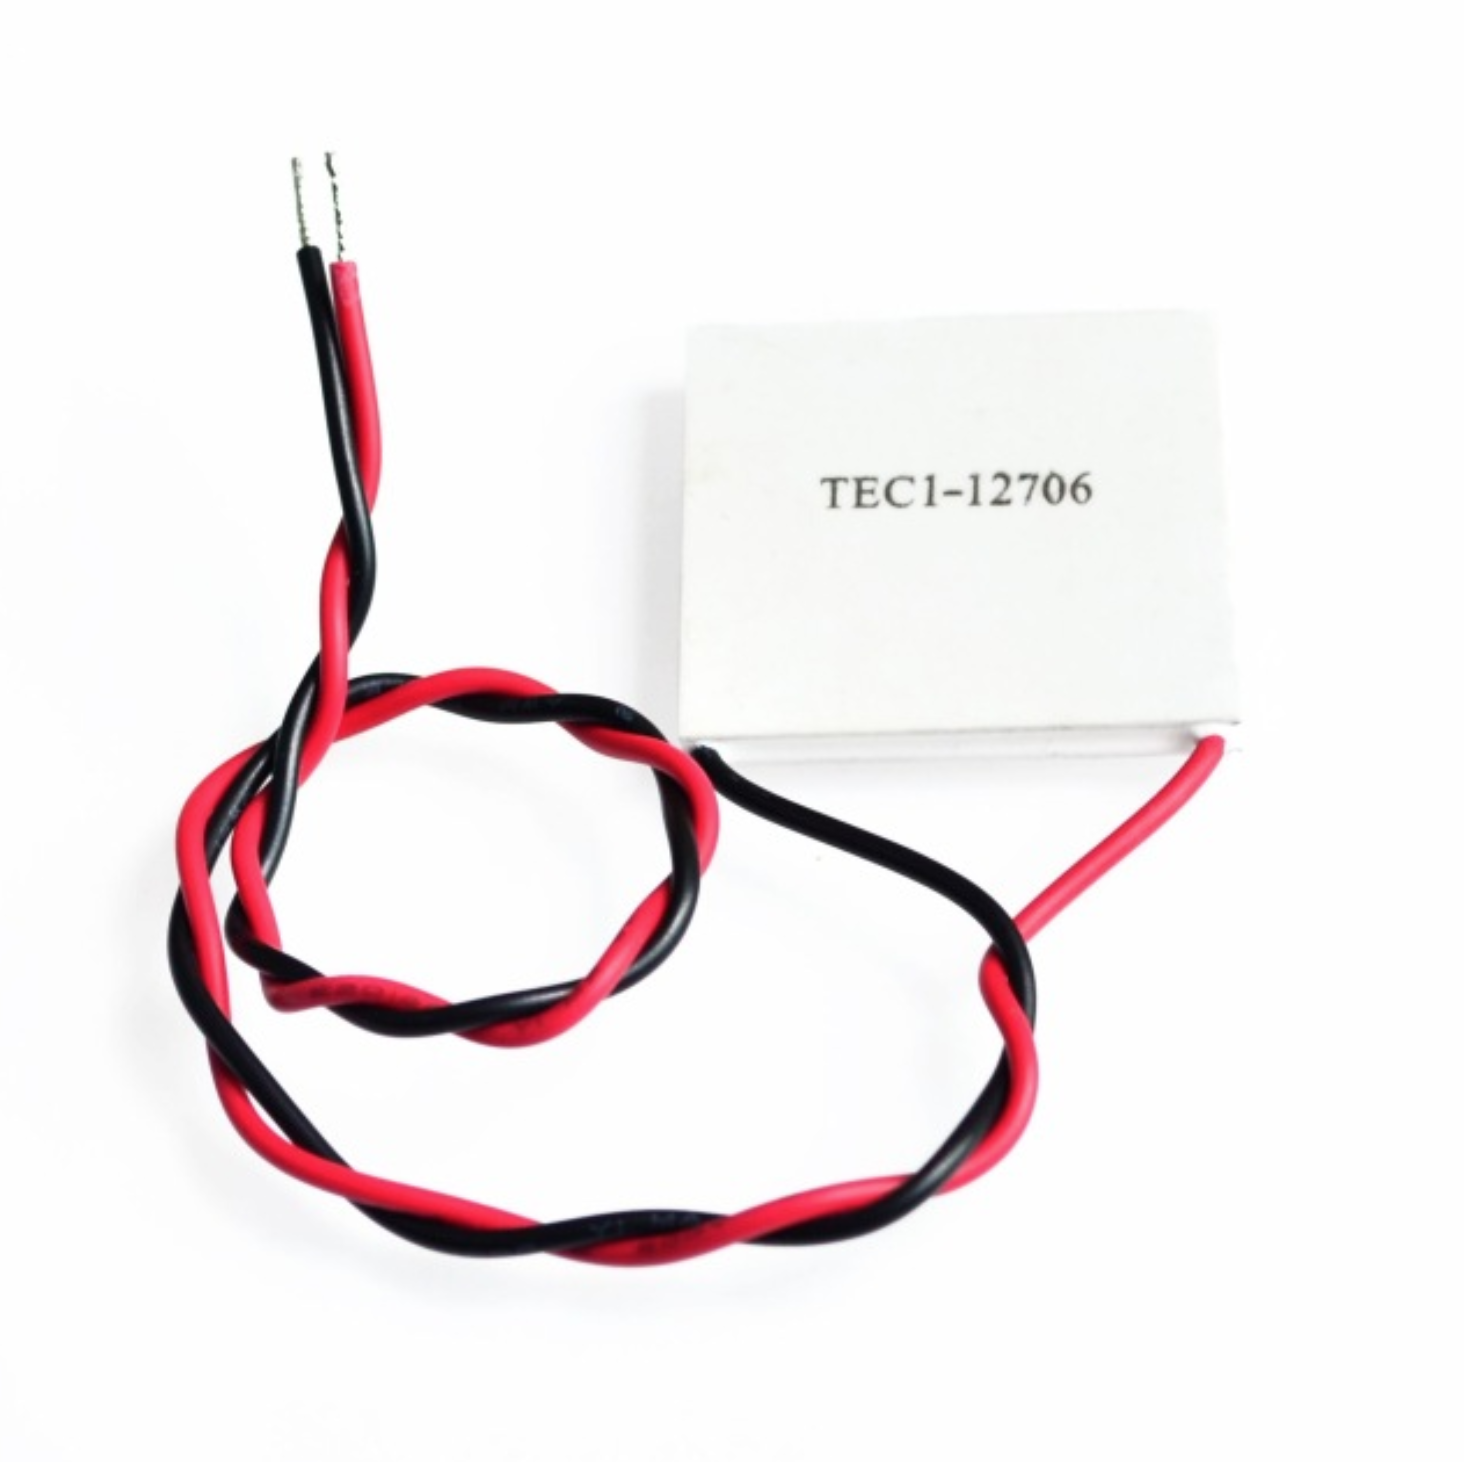 TEC1-12706 Thermoelectric Peltier Cooler แผ่นสร้างความเย็นเทอโมอิเล็กทริค